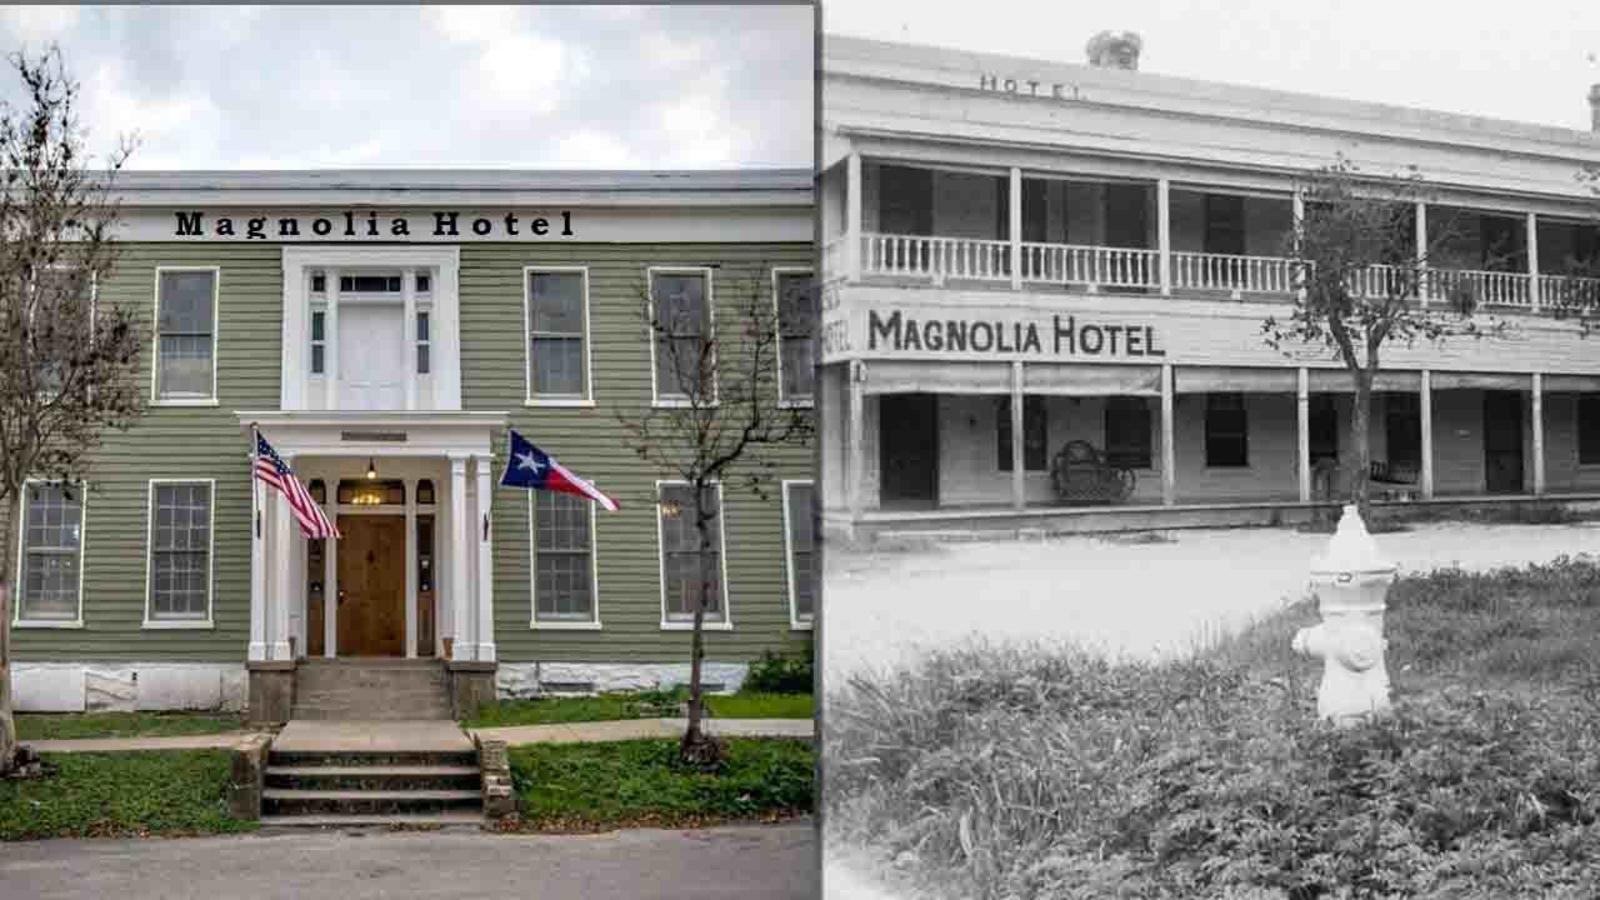 Haunted Magnolia Hotel Open For Overnight Stays In Seguin